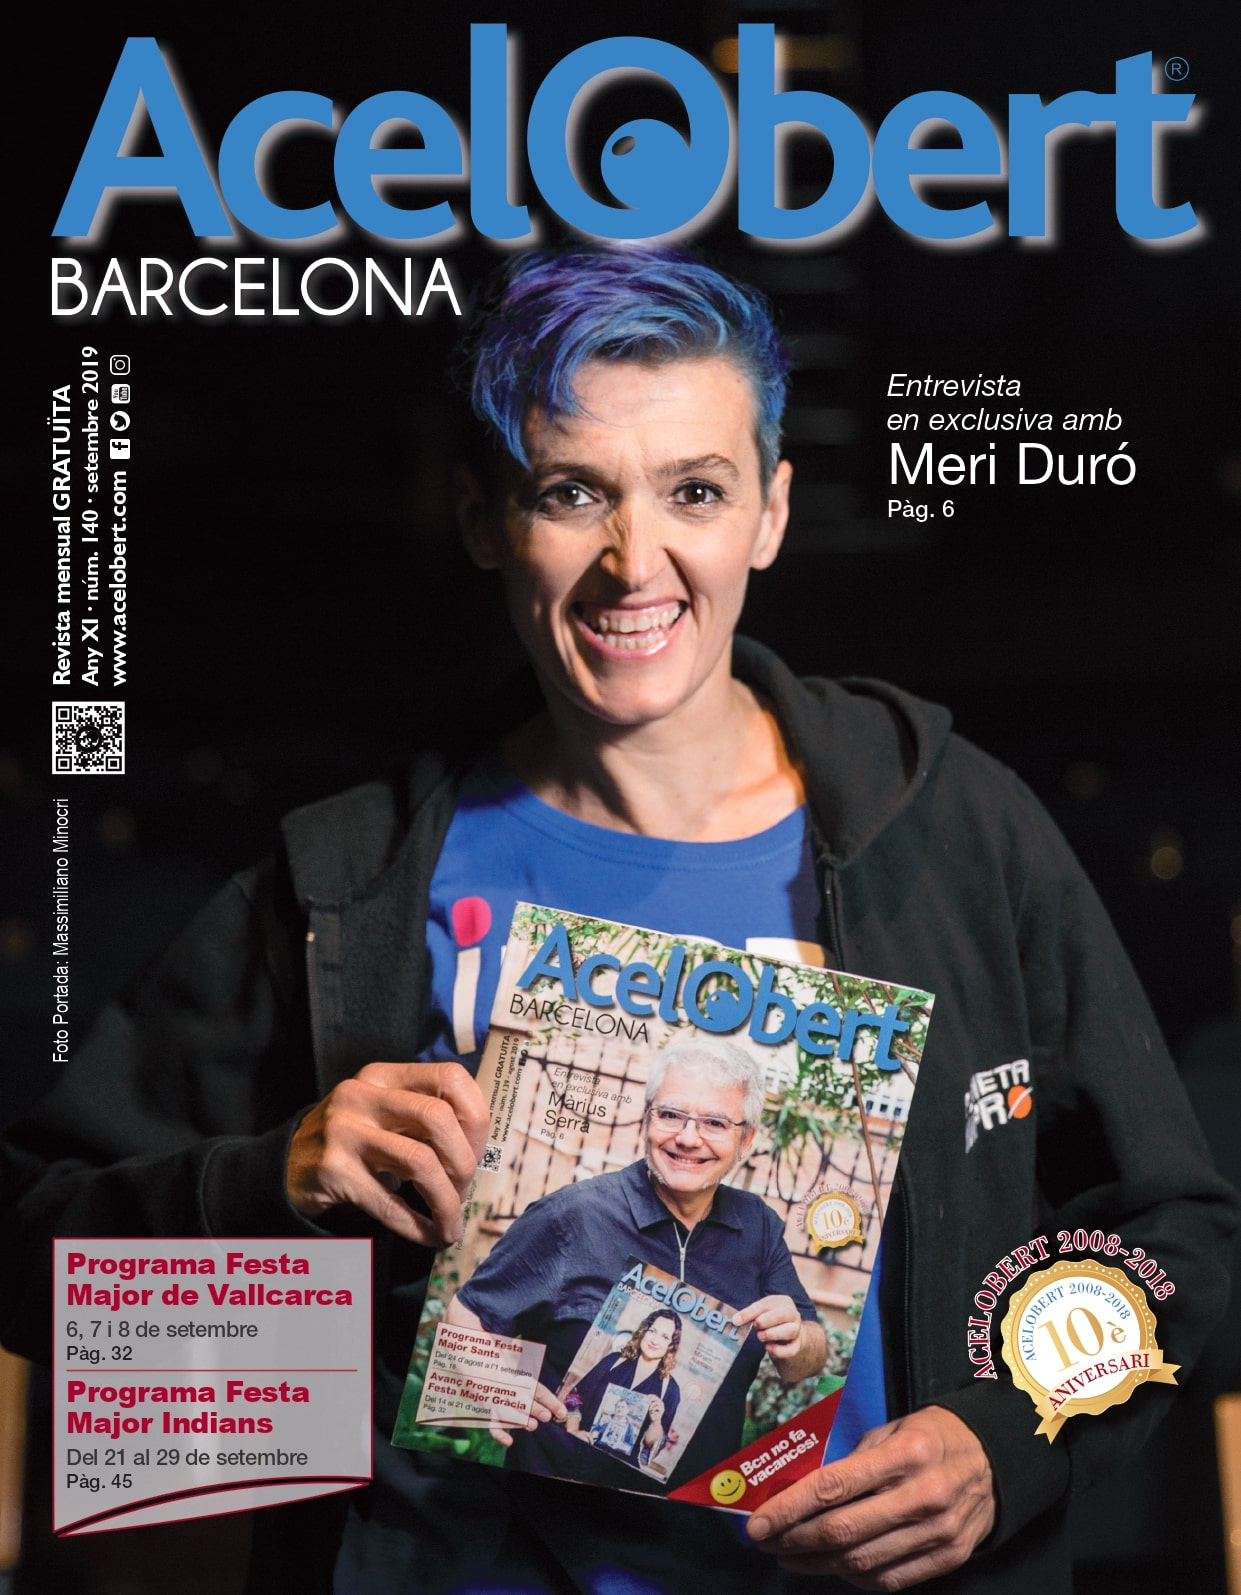 Acelobert Barcelona nº 140 SETEMBRE 2019